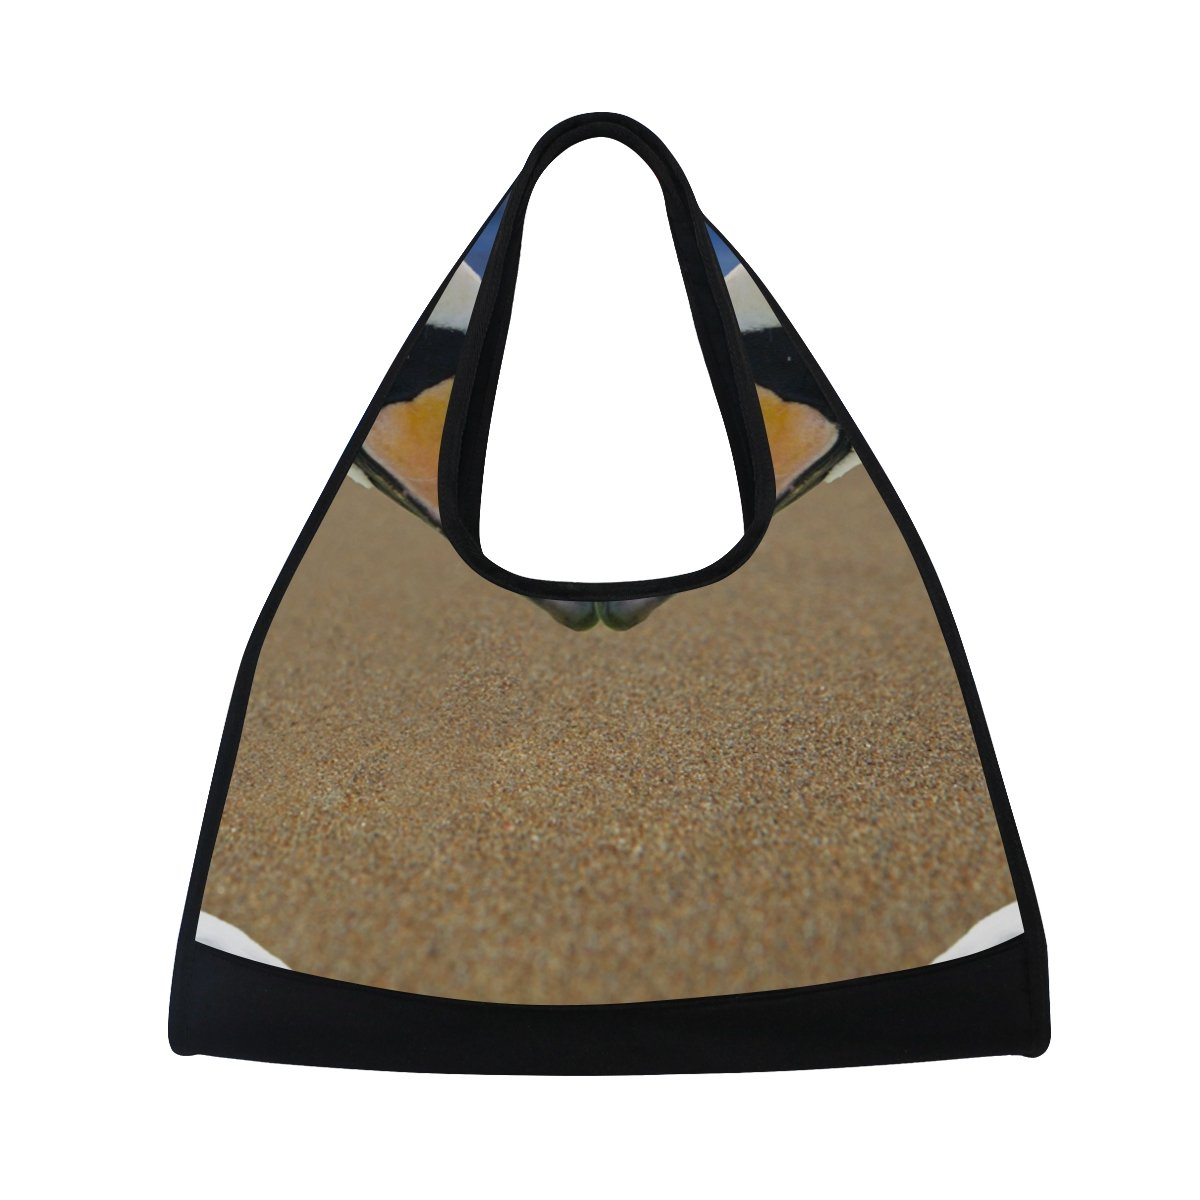 AHOMY Canvas Sports Gym Bag Beach Swan Love Kiss Travel Shoulder Bag